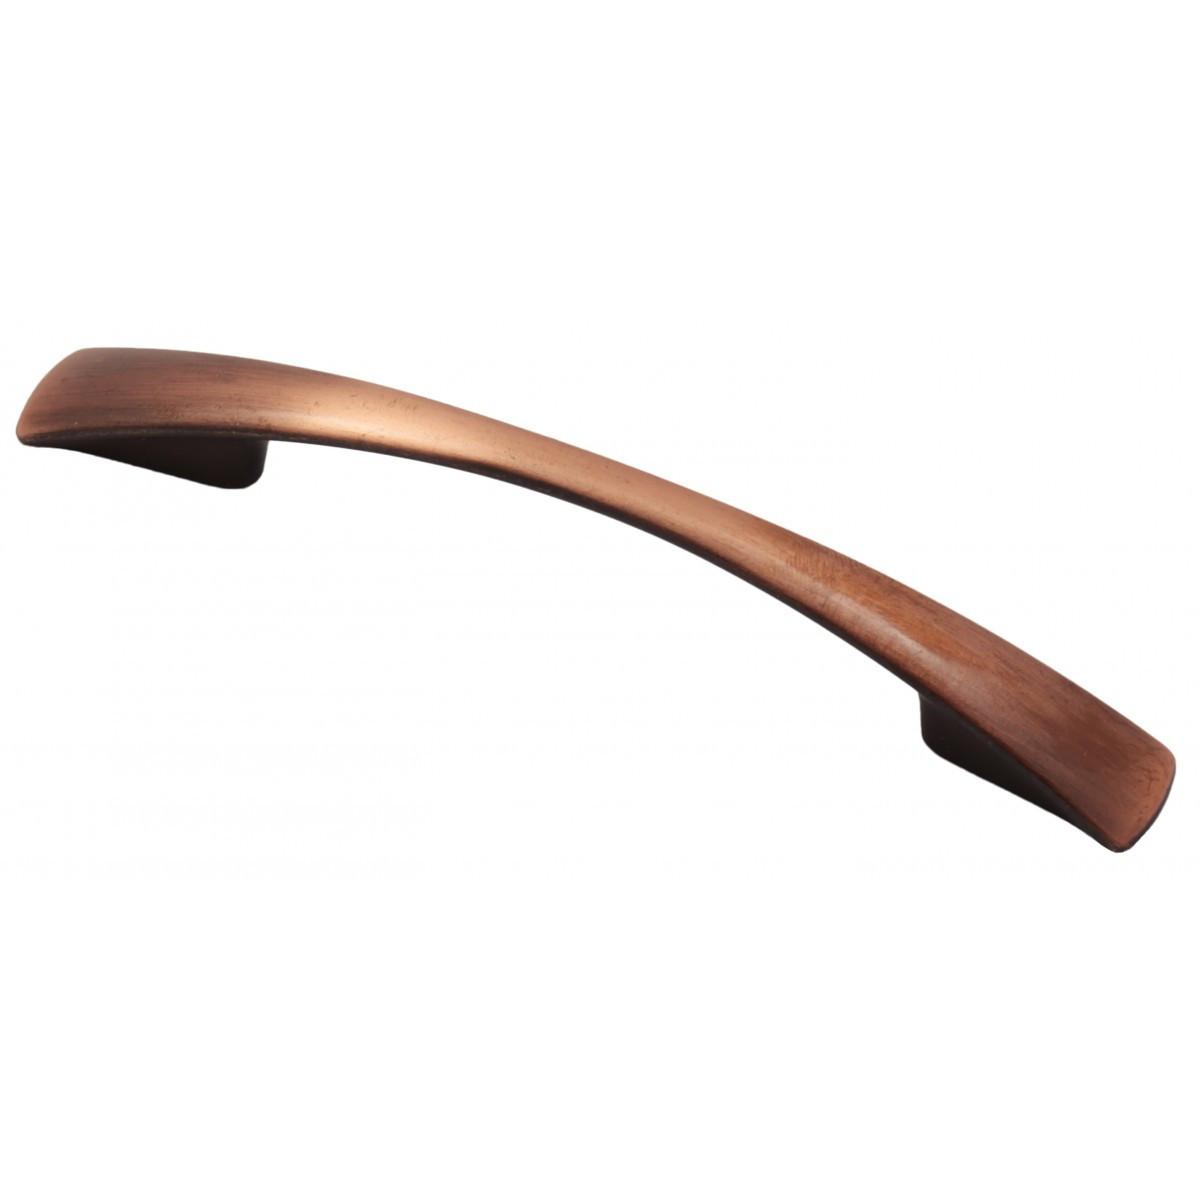 Ручка меблева Ozkardesler 5075-09 SEMBOL 96мм Мідь